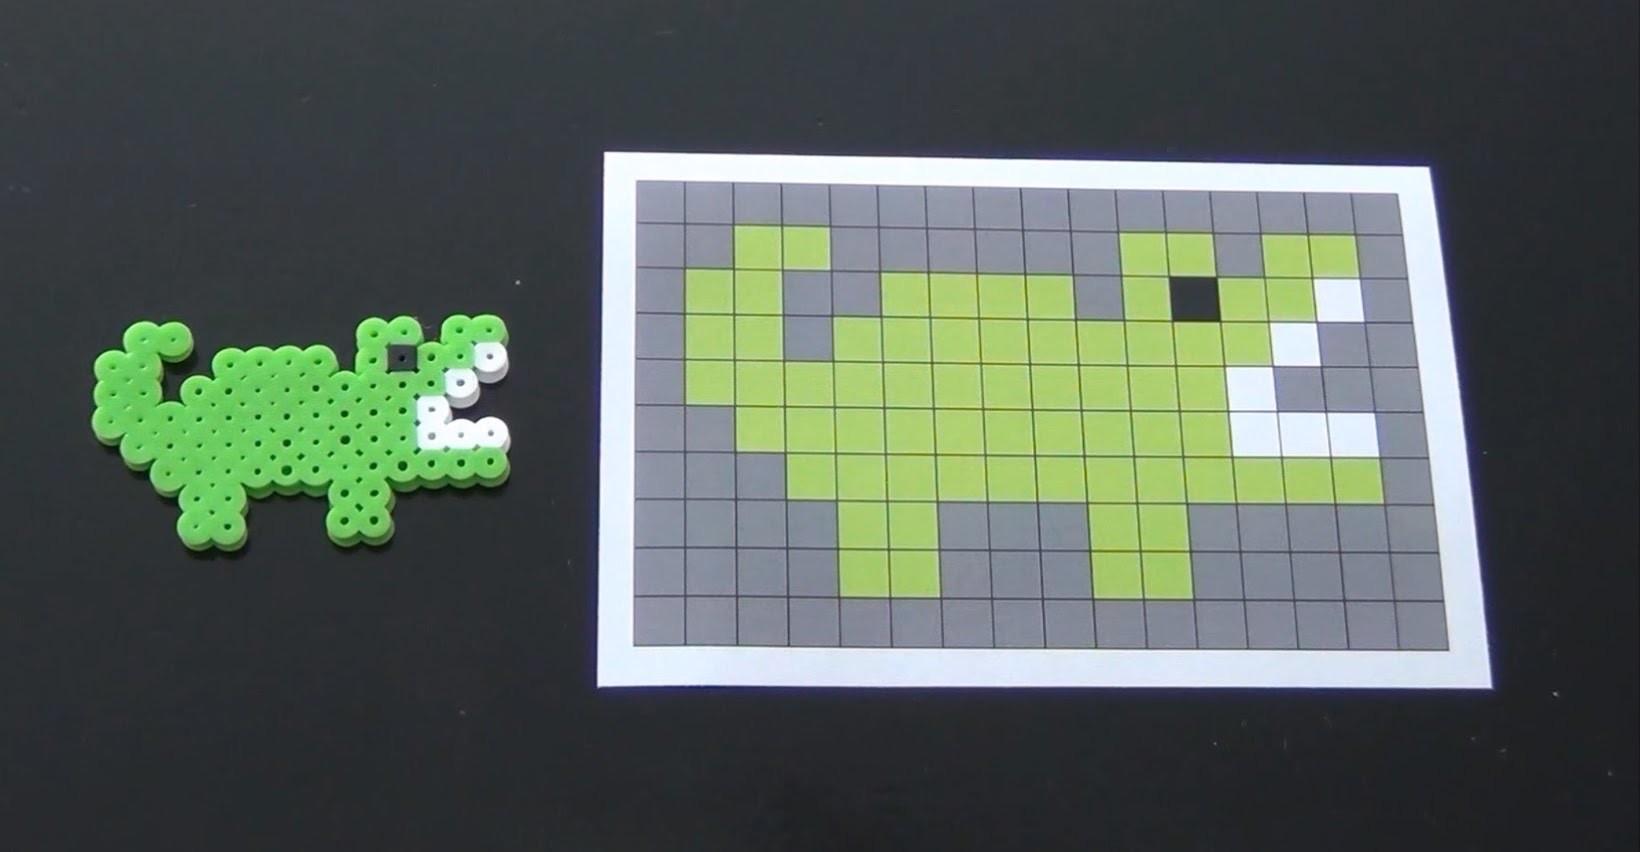 How to Make a Cute Perler Bead Gator